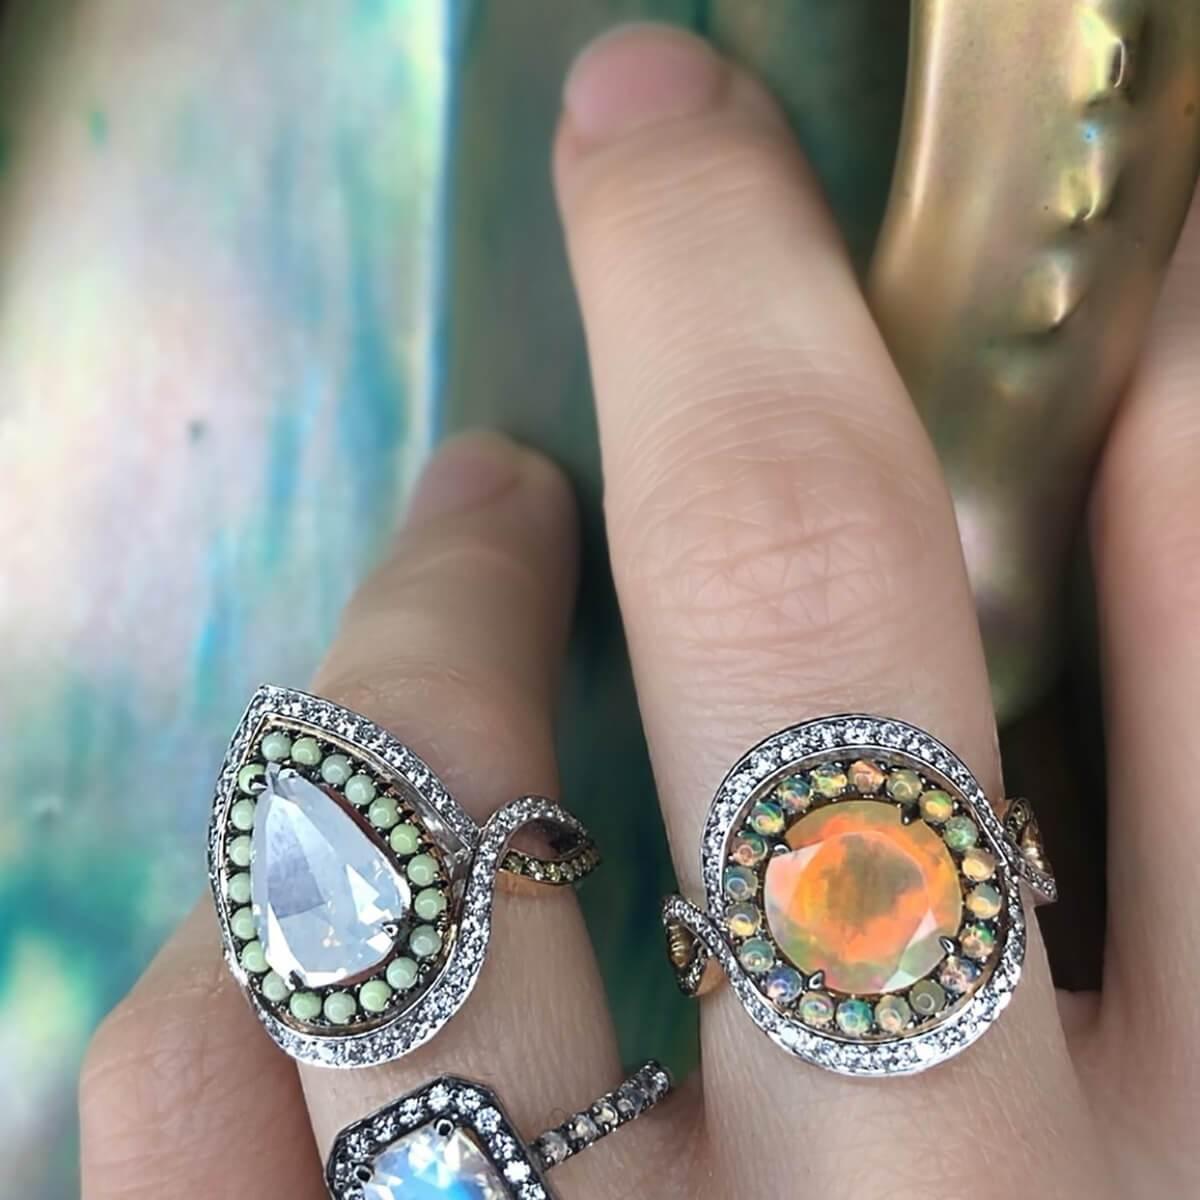 Joke Quick Twilight Entourage Ring With Ethiopian Opal And Diamonds in Metallic